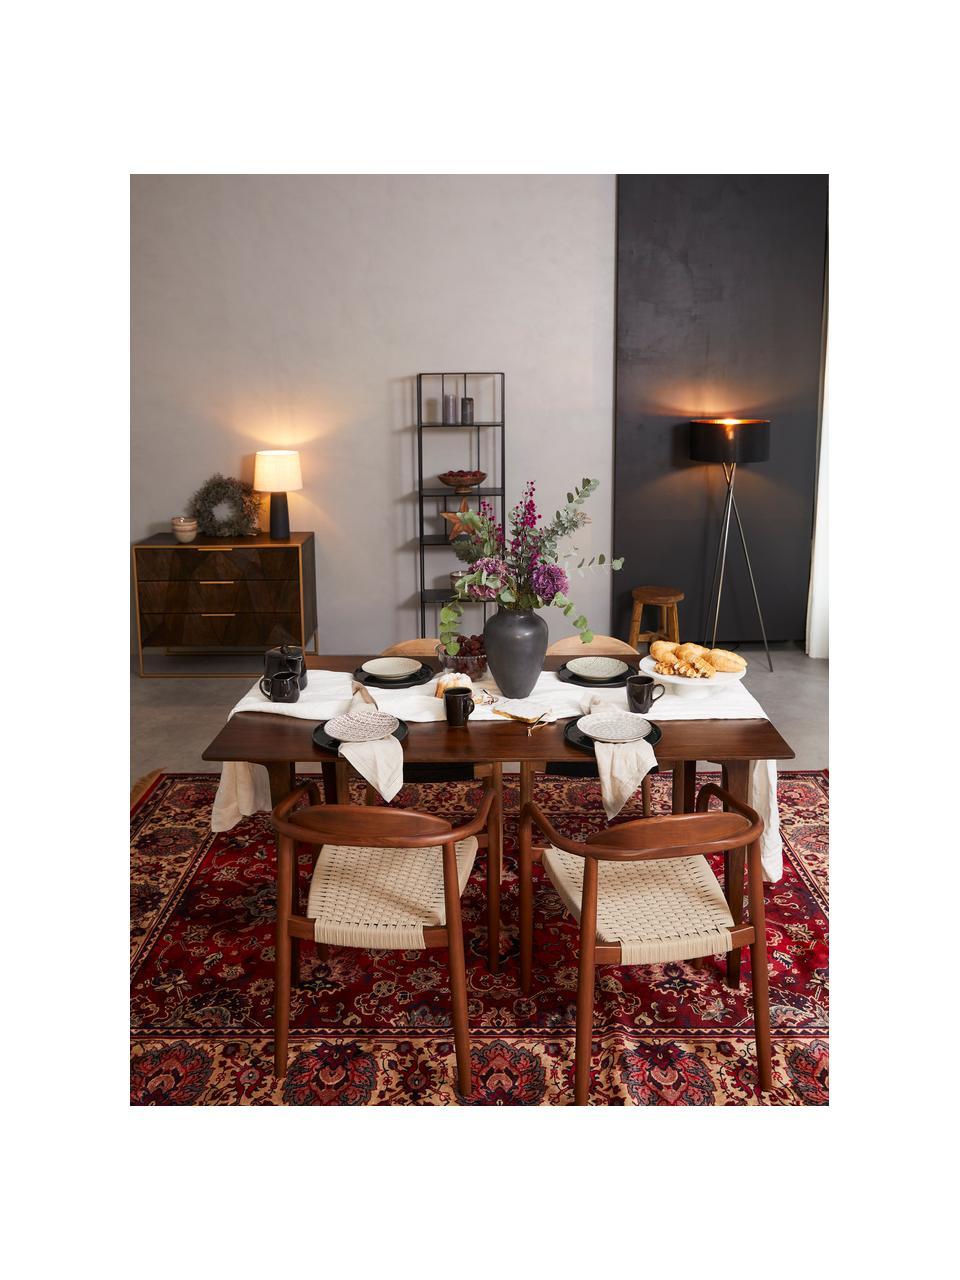 Massivholz Esstisch Archie, Massives Mangoholz, lackiert, Mangoholz, dunkel lackiert, B 160 x T 90 cm